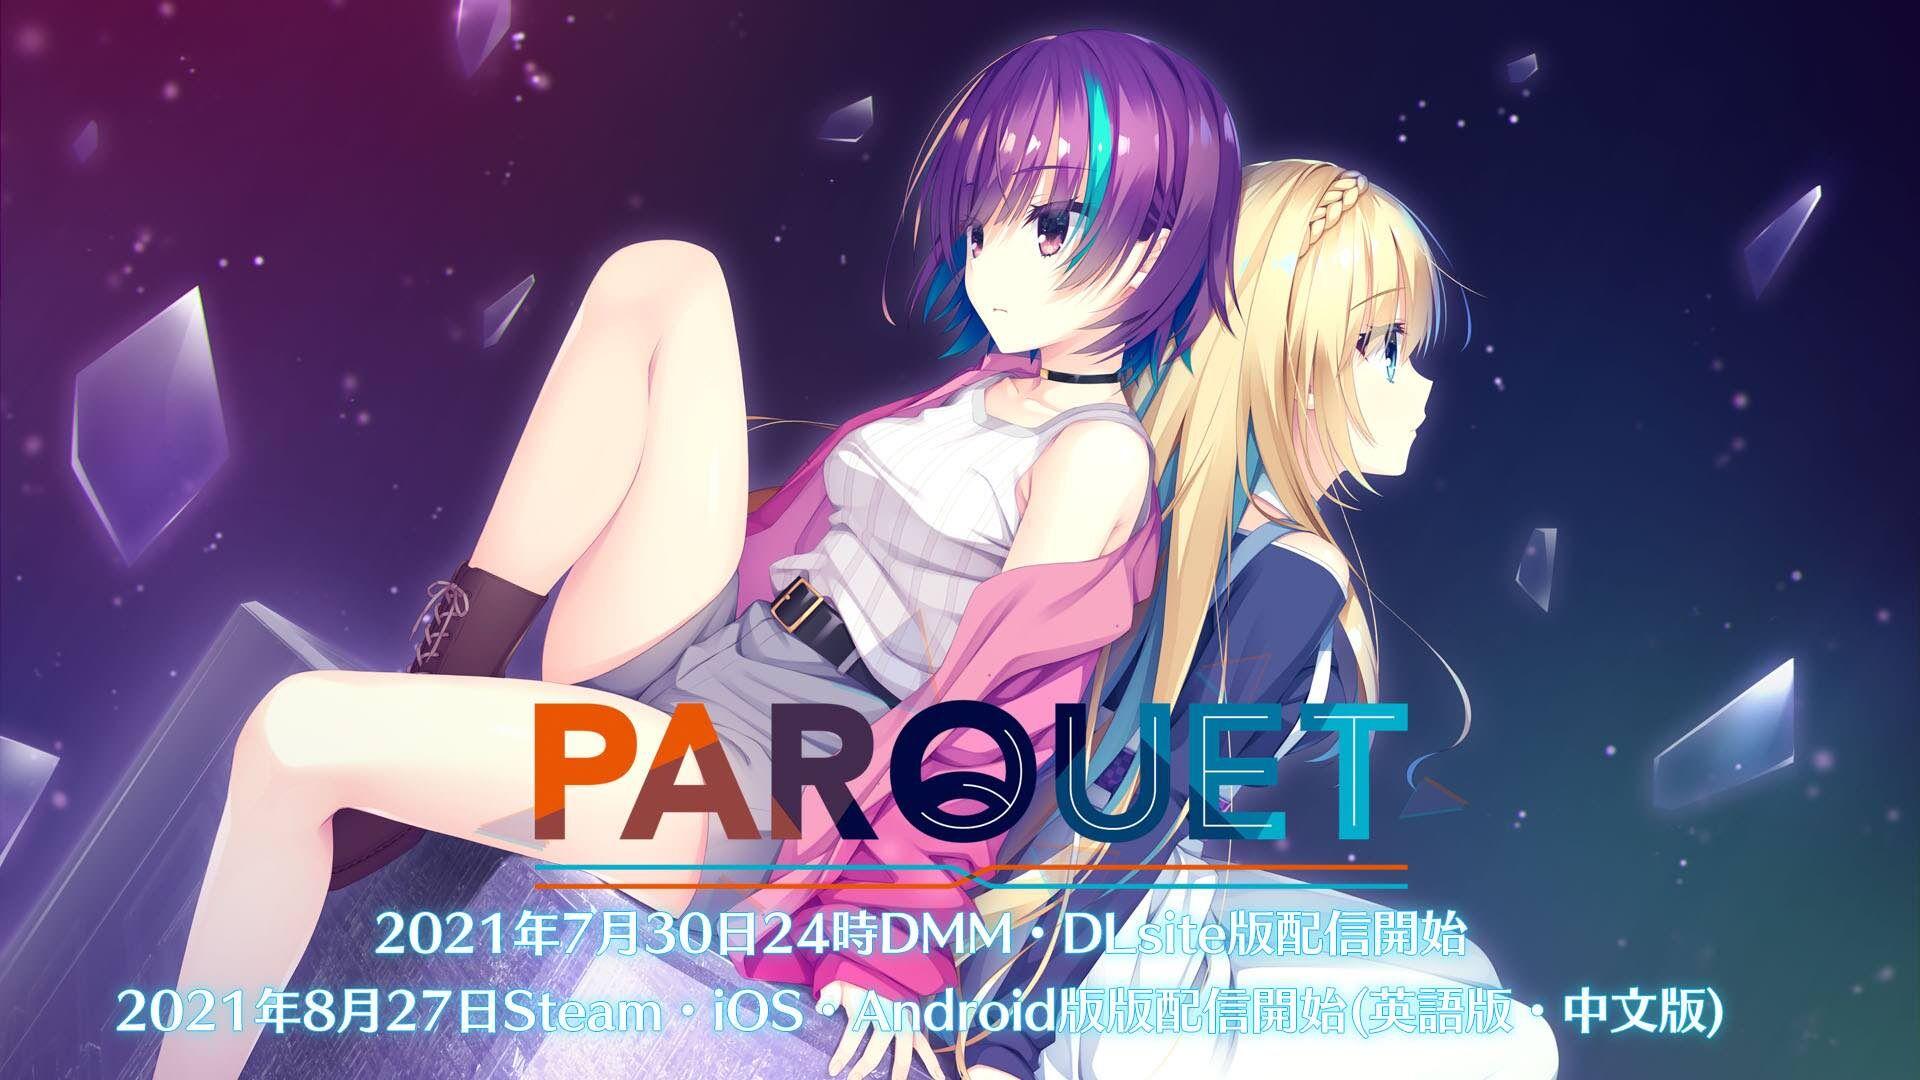 【KR/ADV/官中】PARQUET [OD] 726M